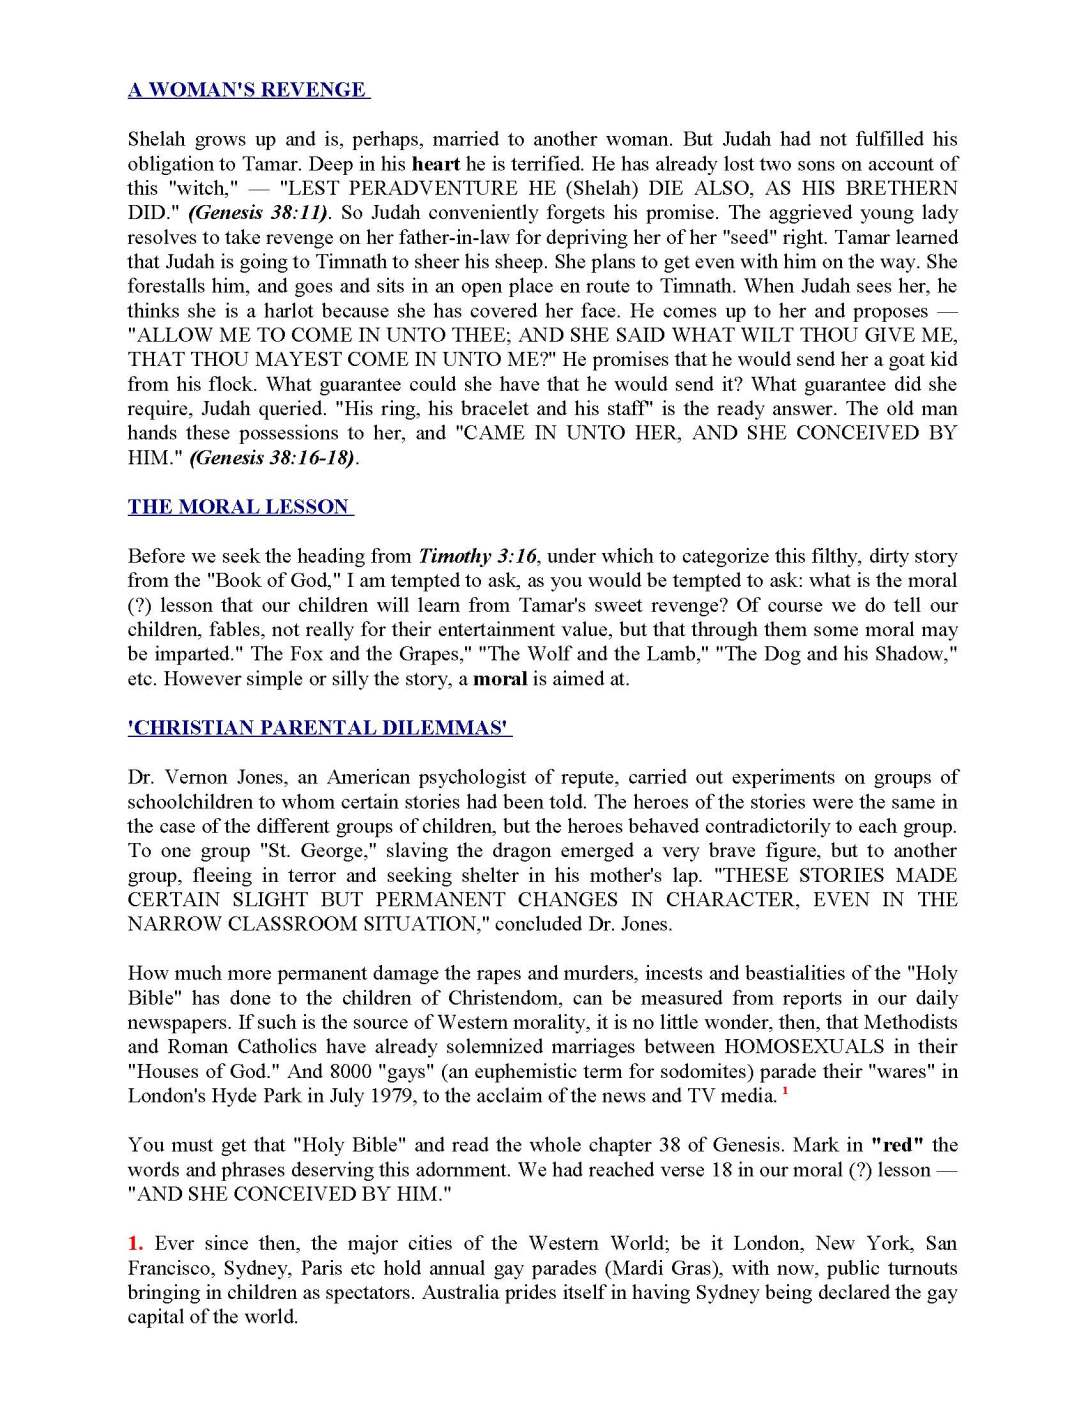 Is The Bible Gods Word [deedat]_Page_35